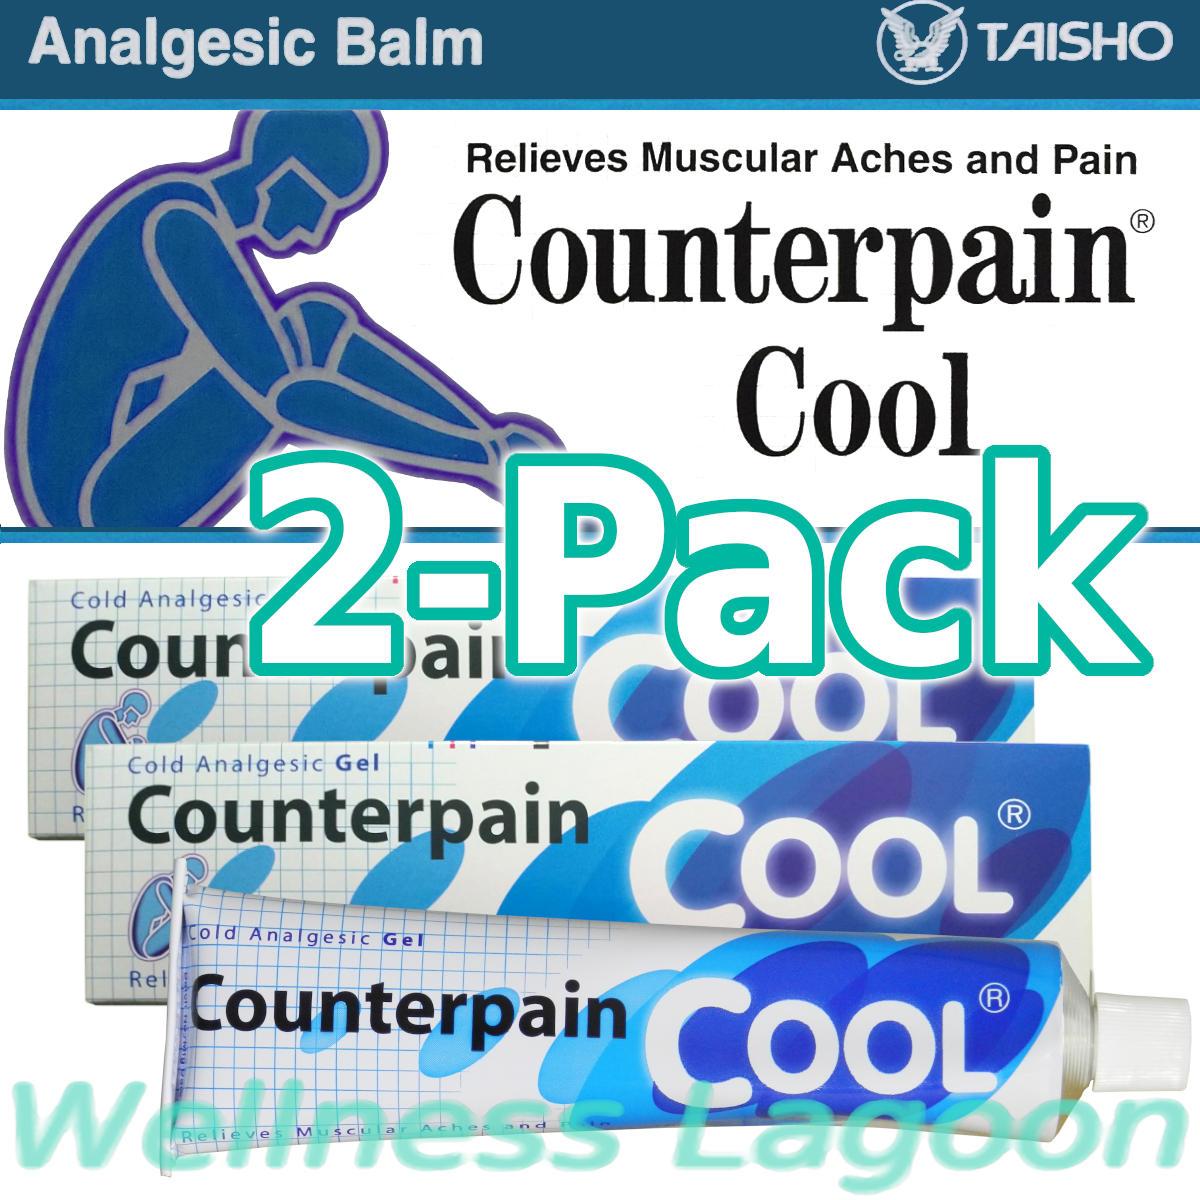 2x Taisho Counterpain Cool Gel (Blue) - 120g